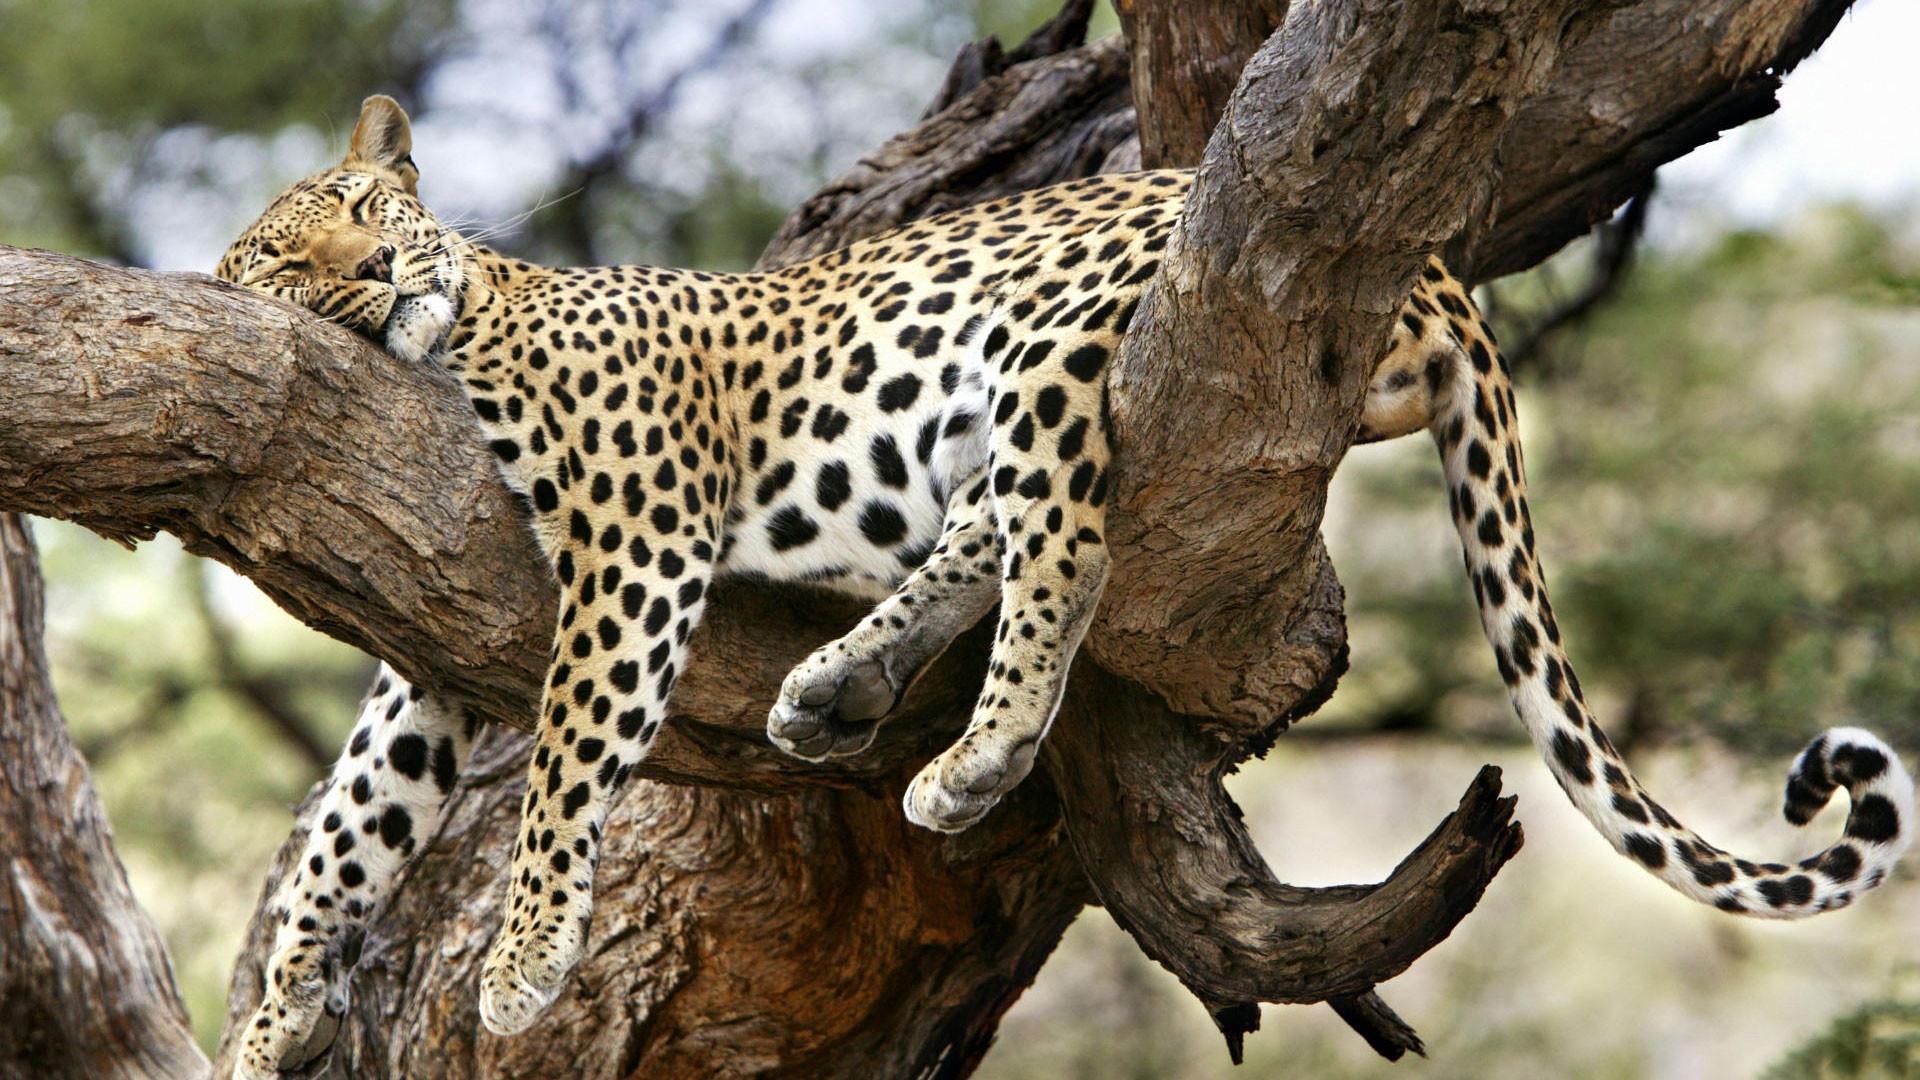 Sleeping Leapard